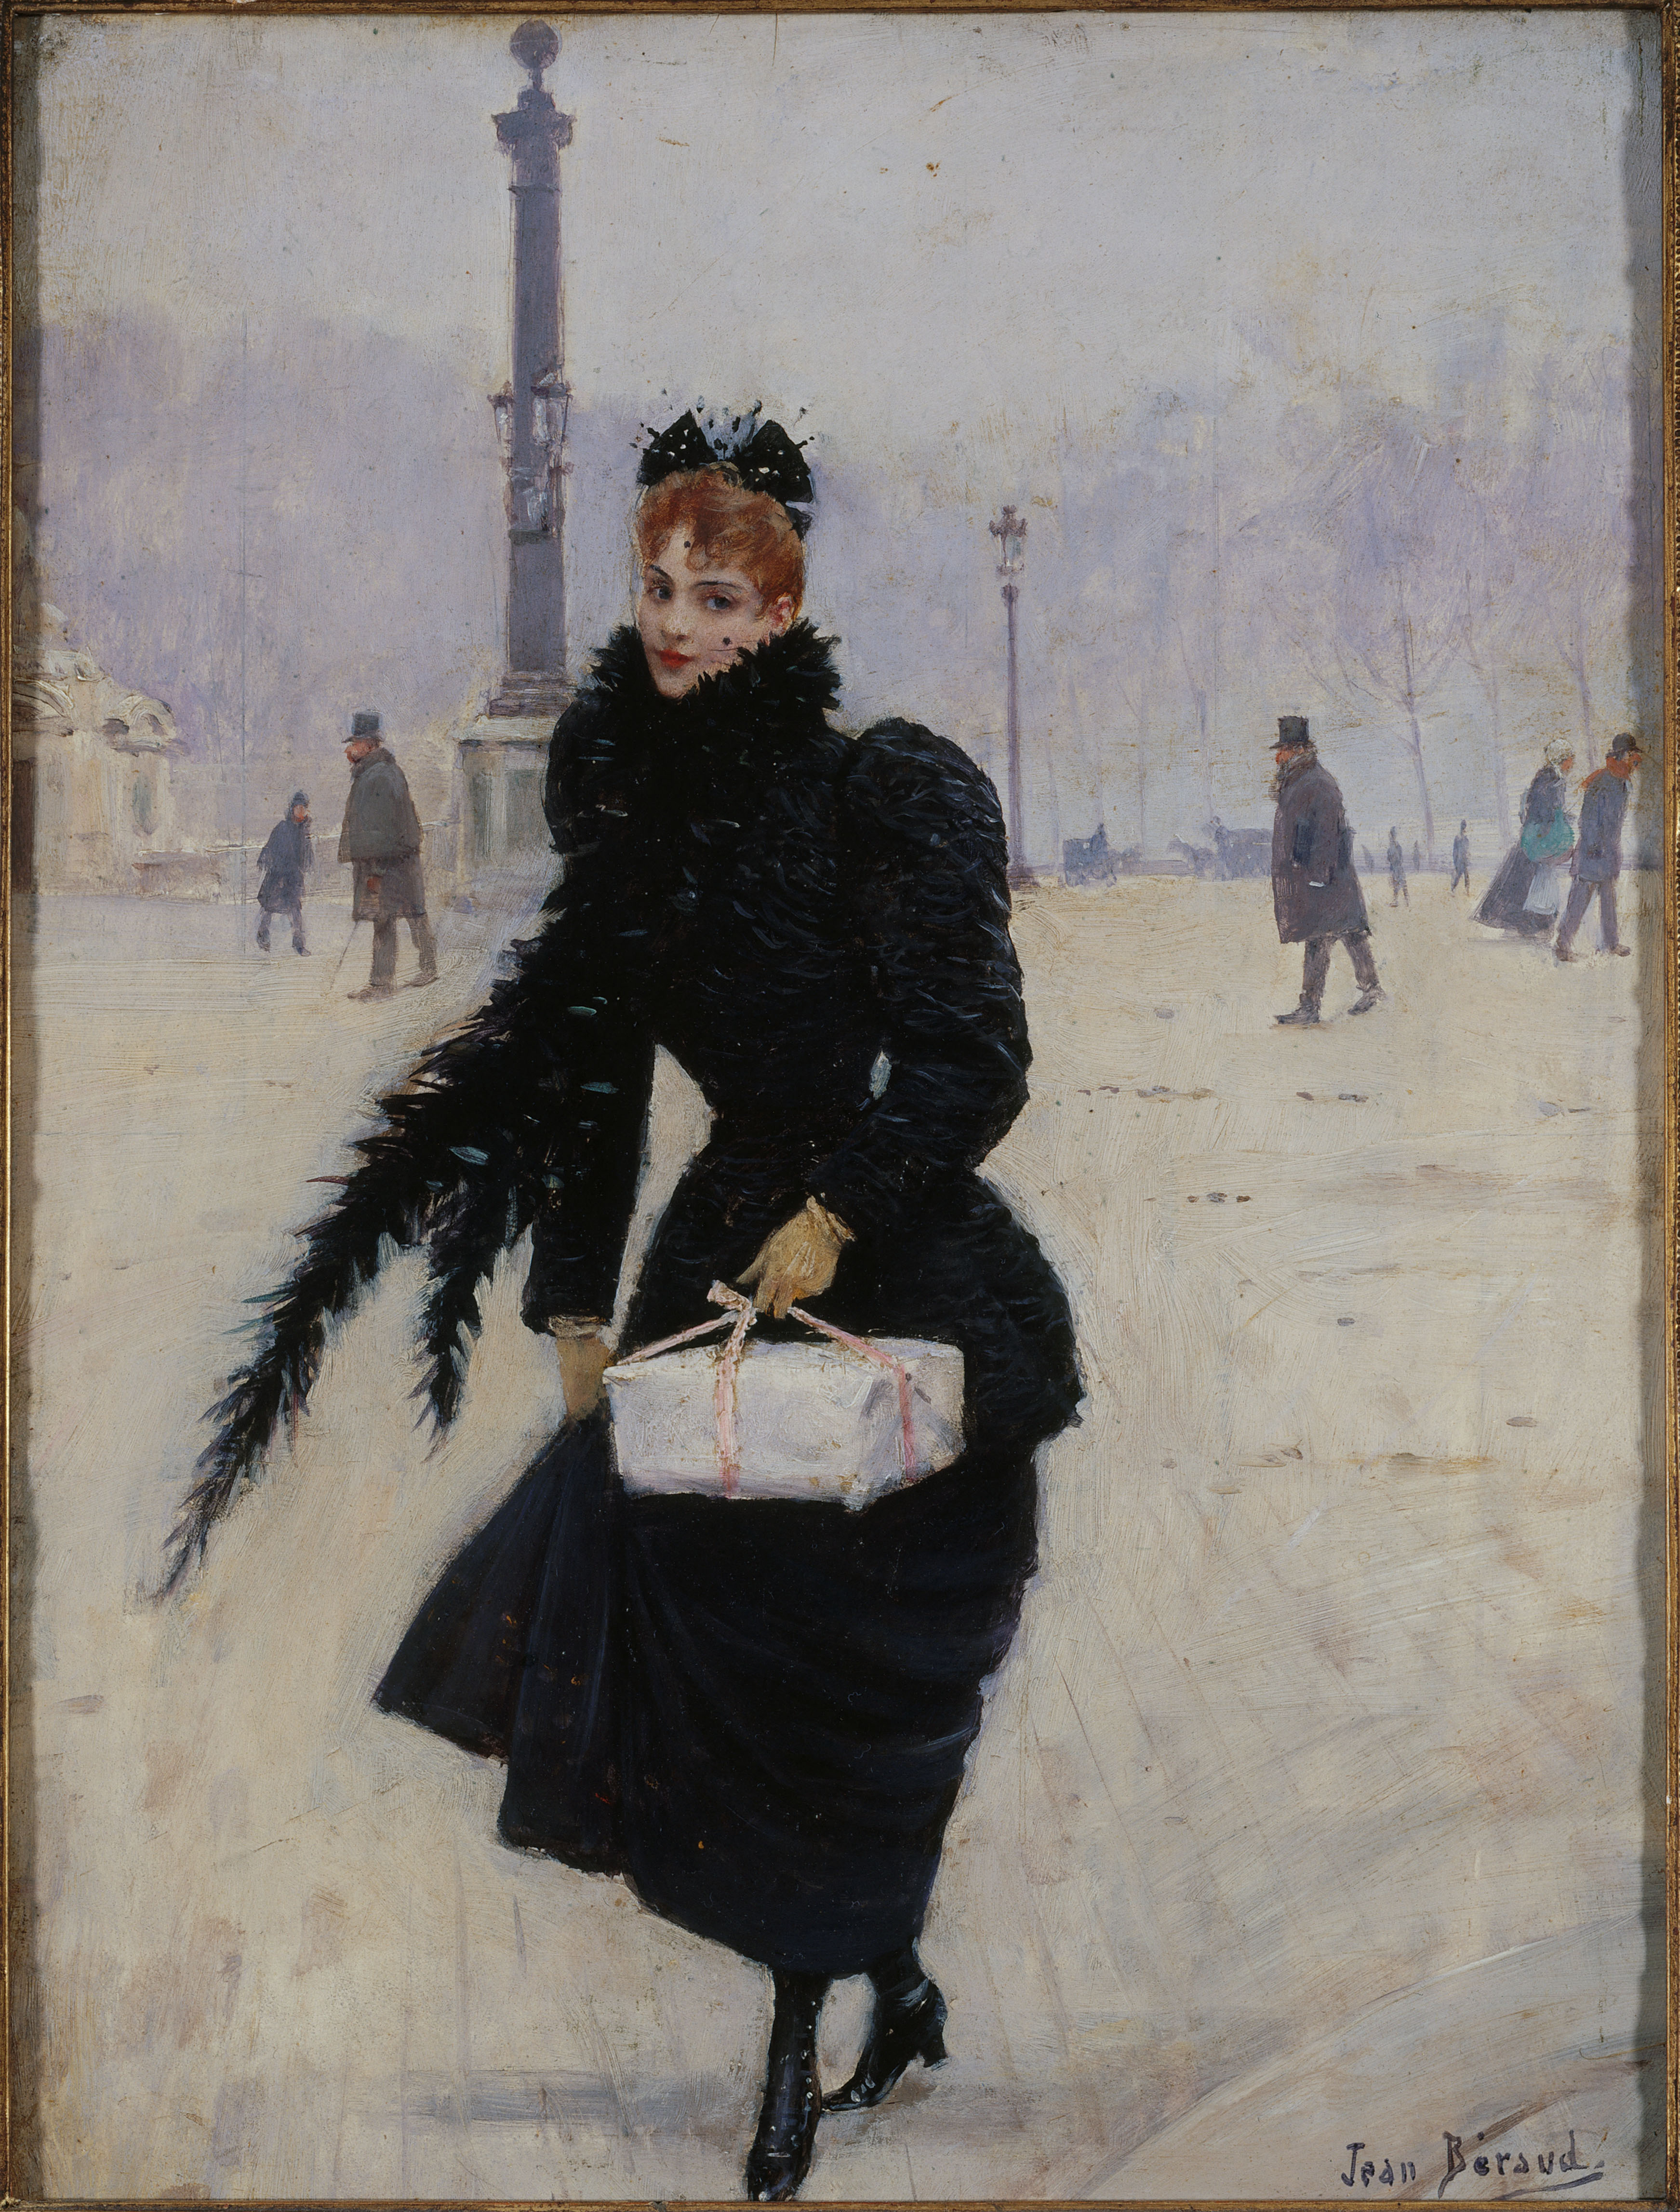 Jean Béraud's Art